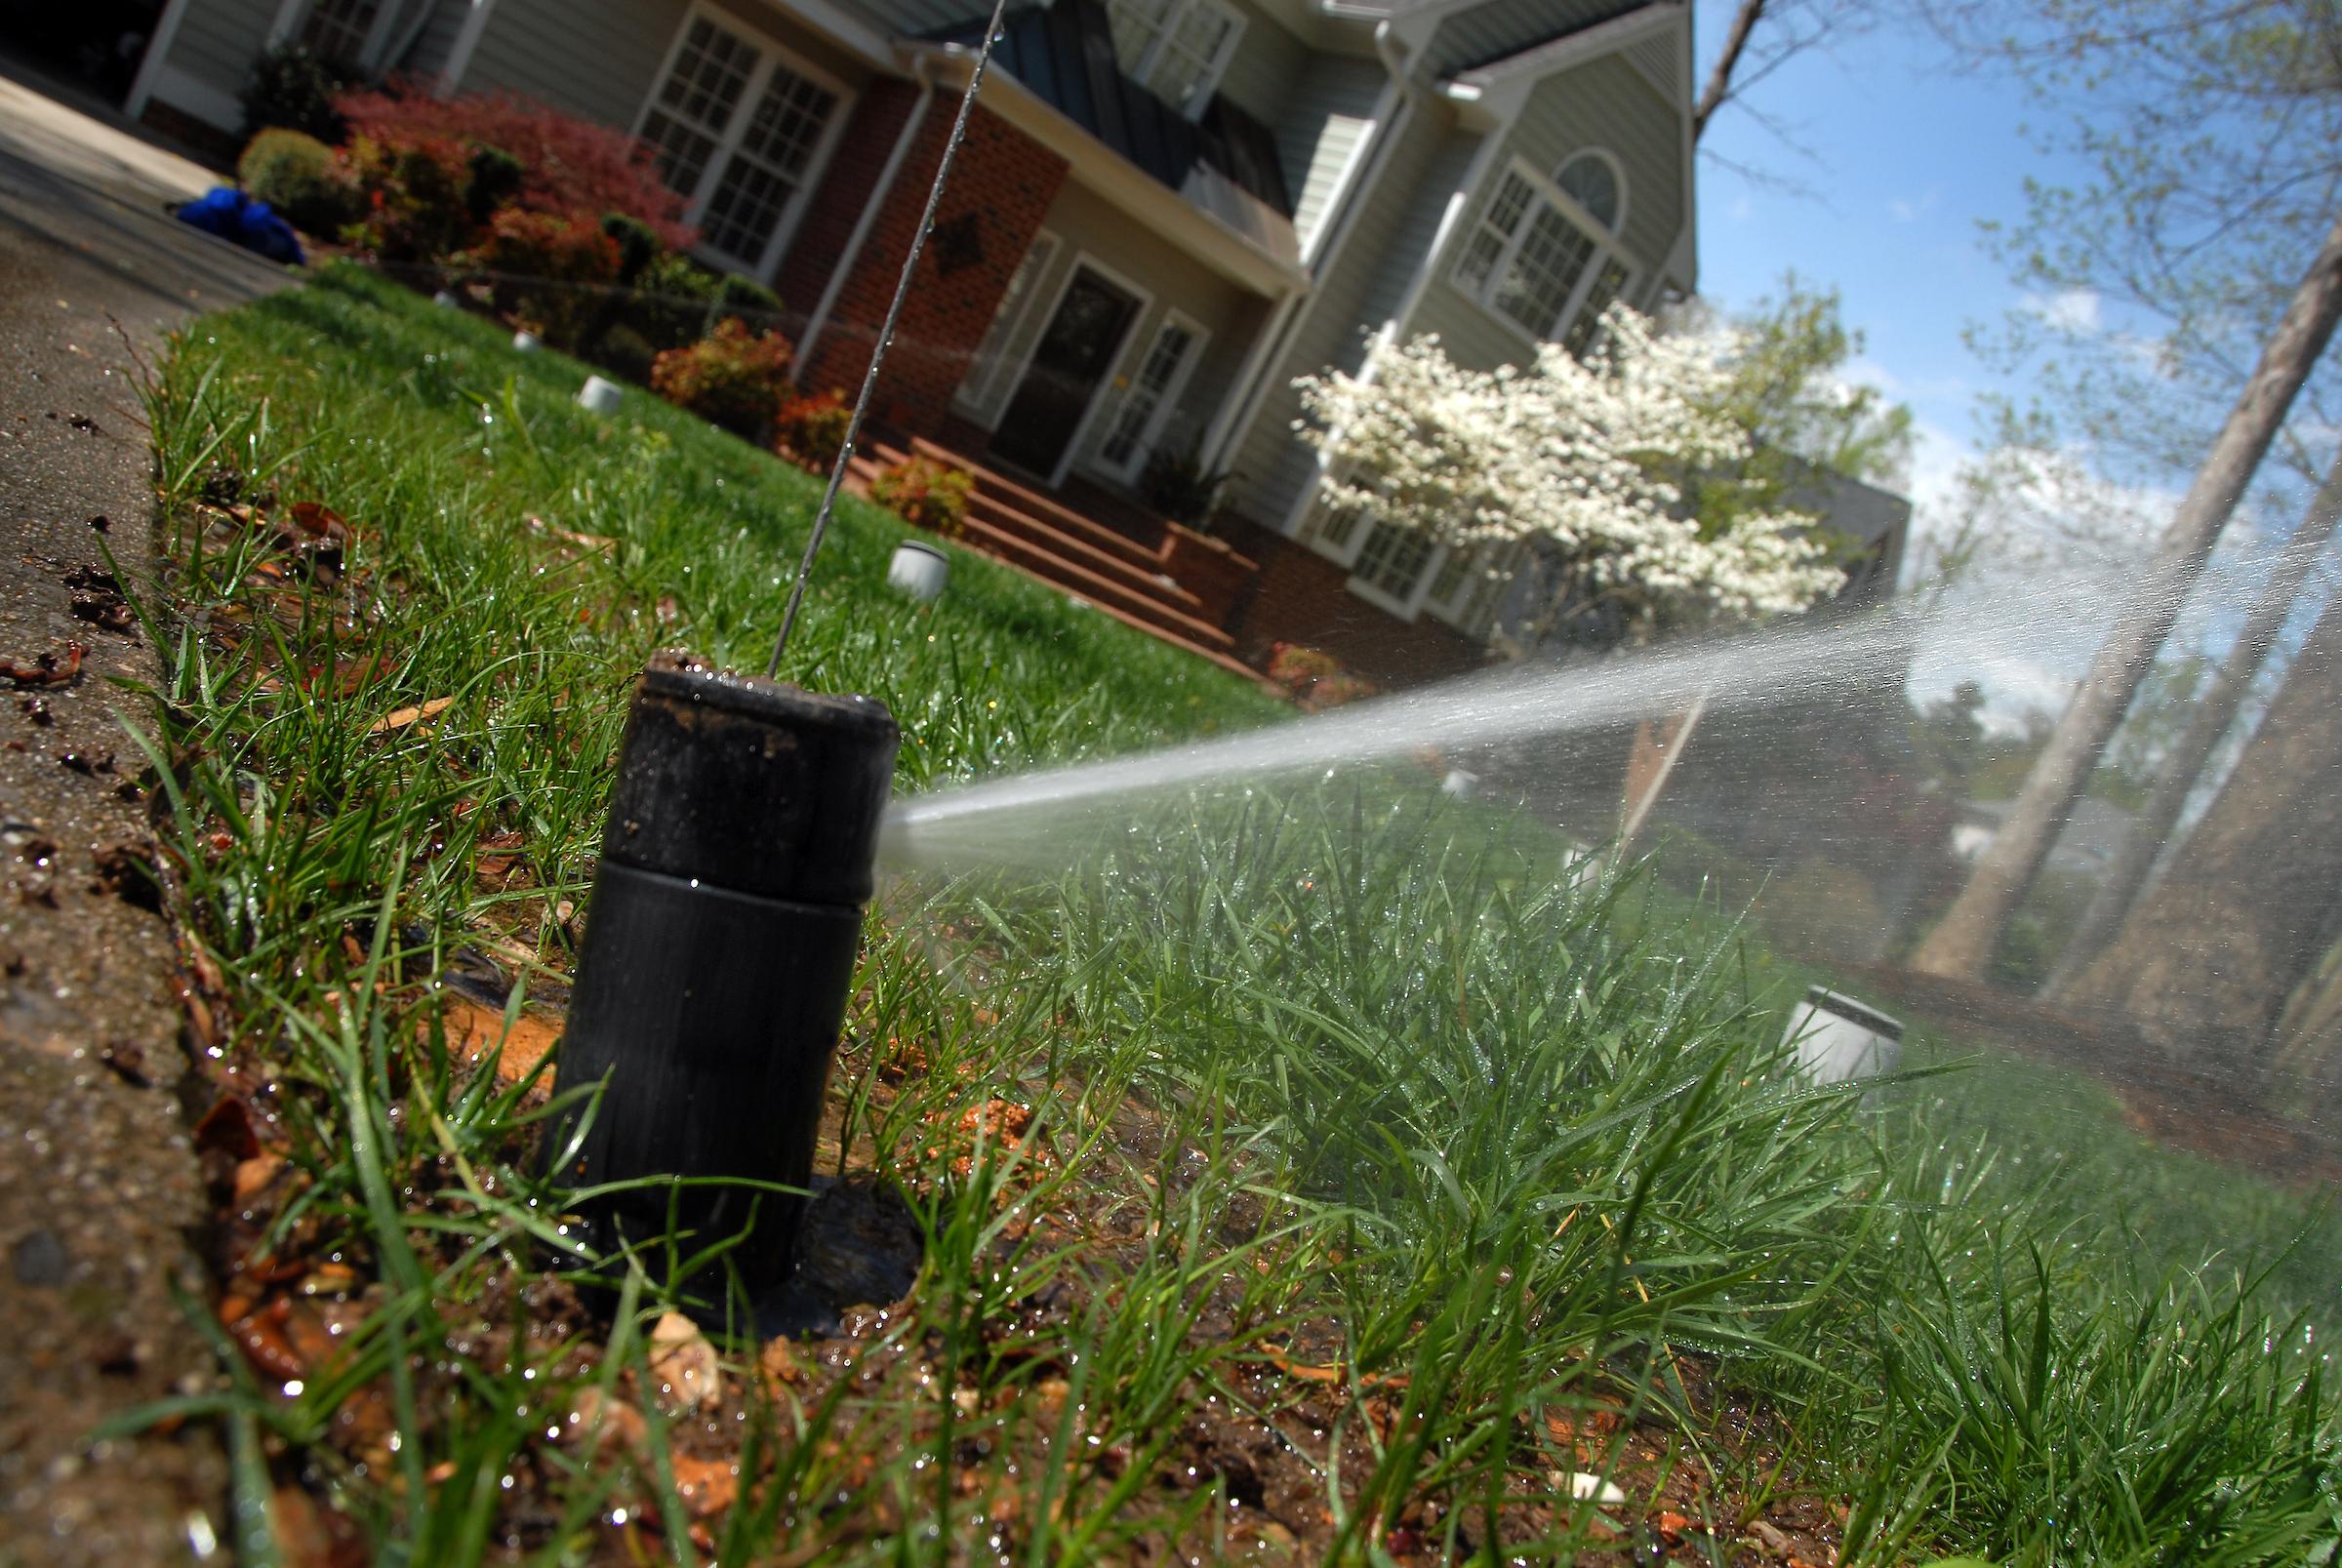 Irrigation head spraying water on lawn